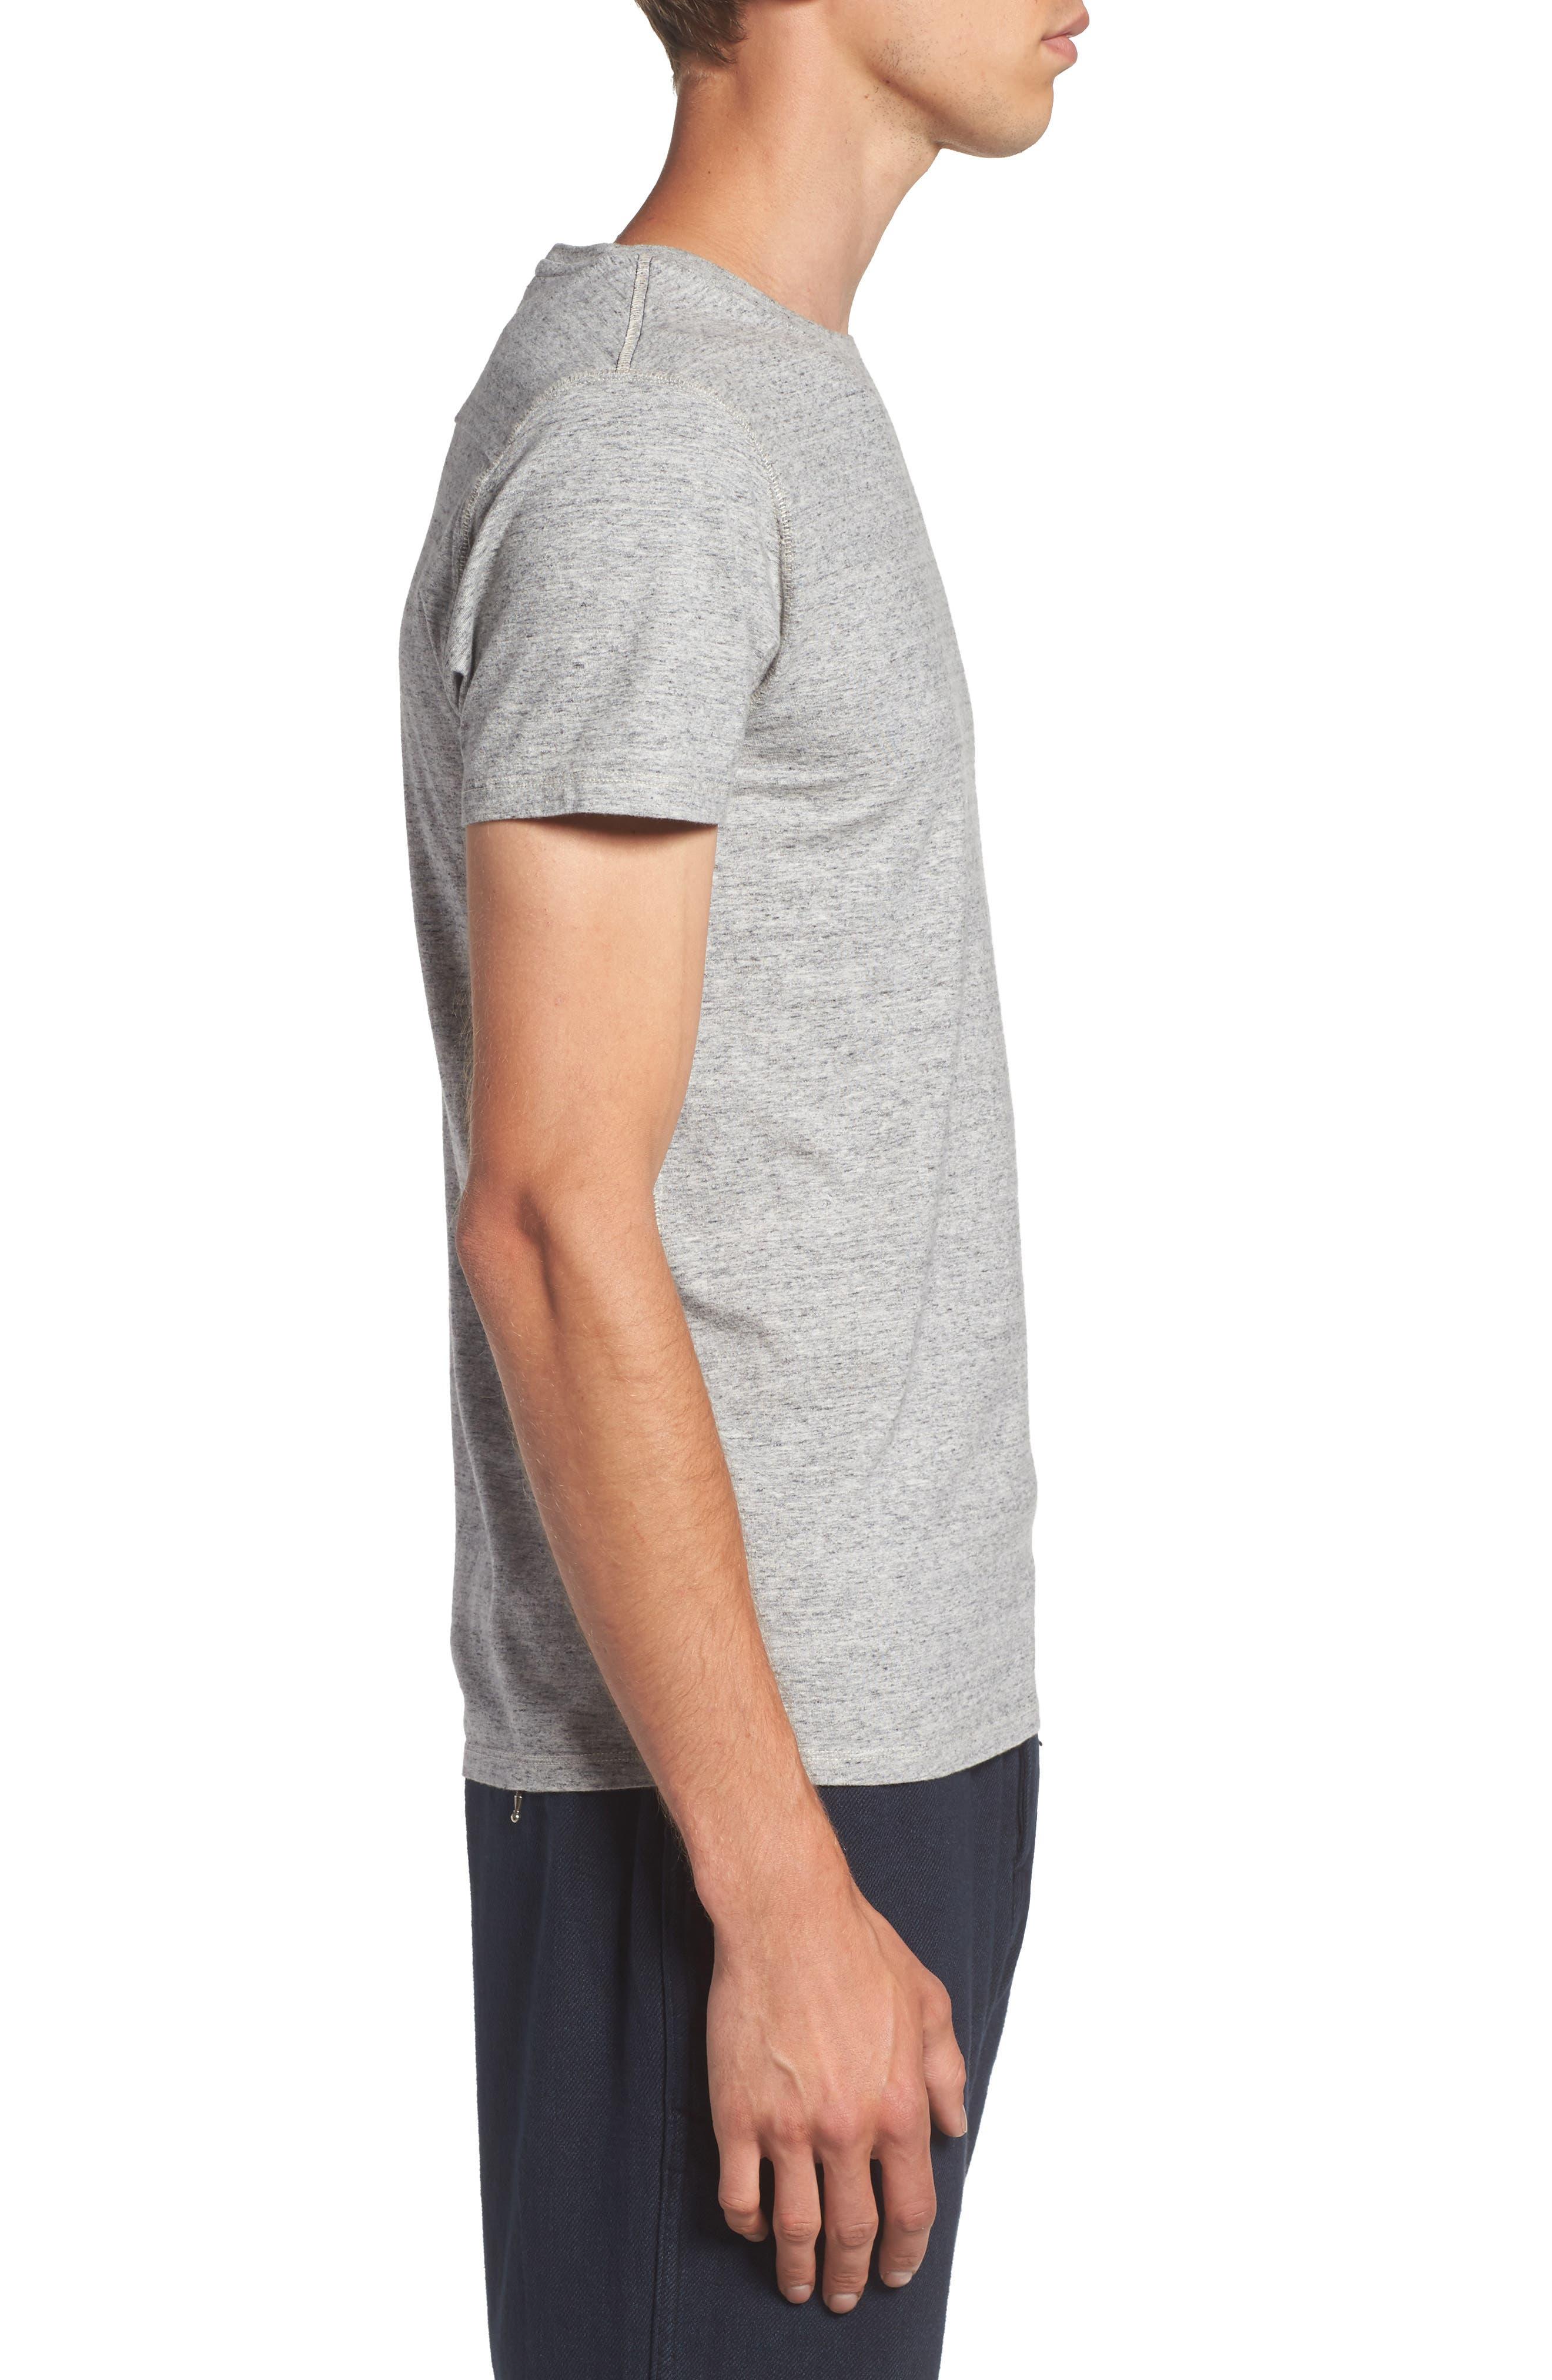 Home Alone Classic T-Shirt,                             Alternate thumbnail 3, color,                             020